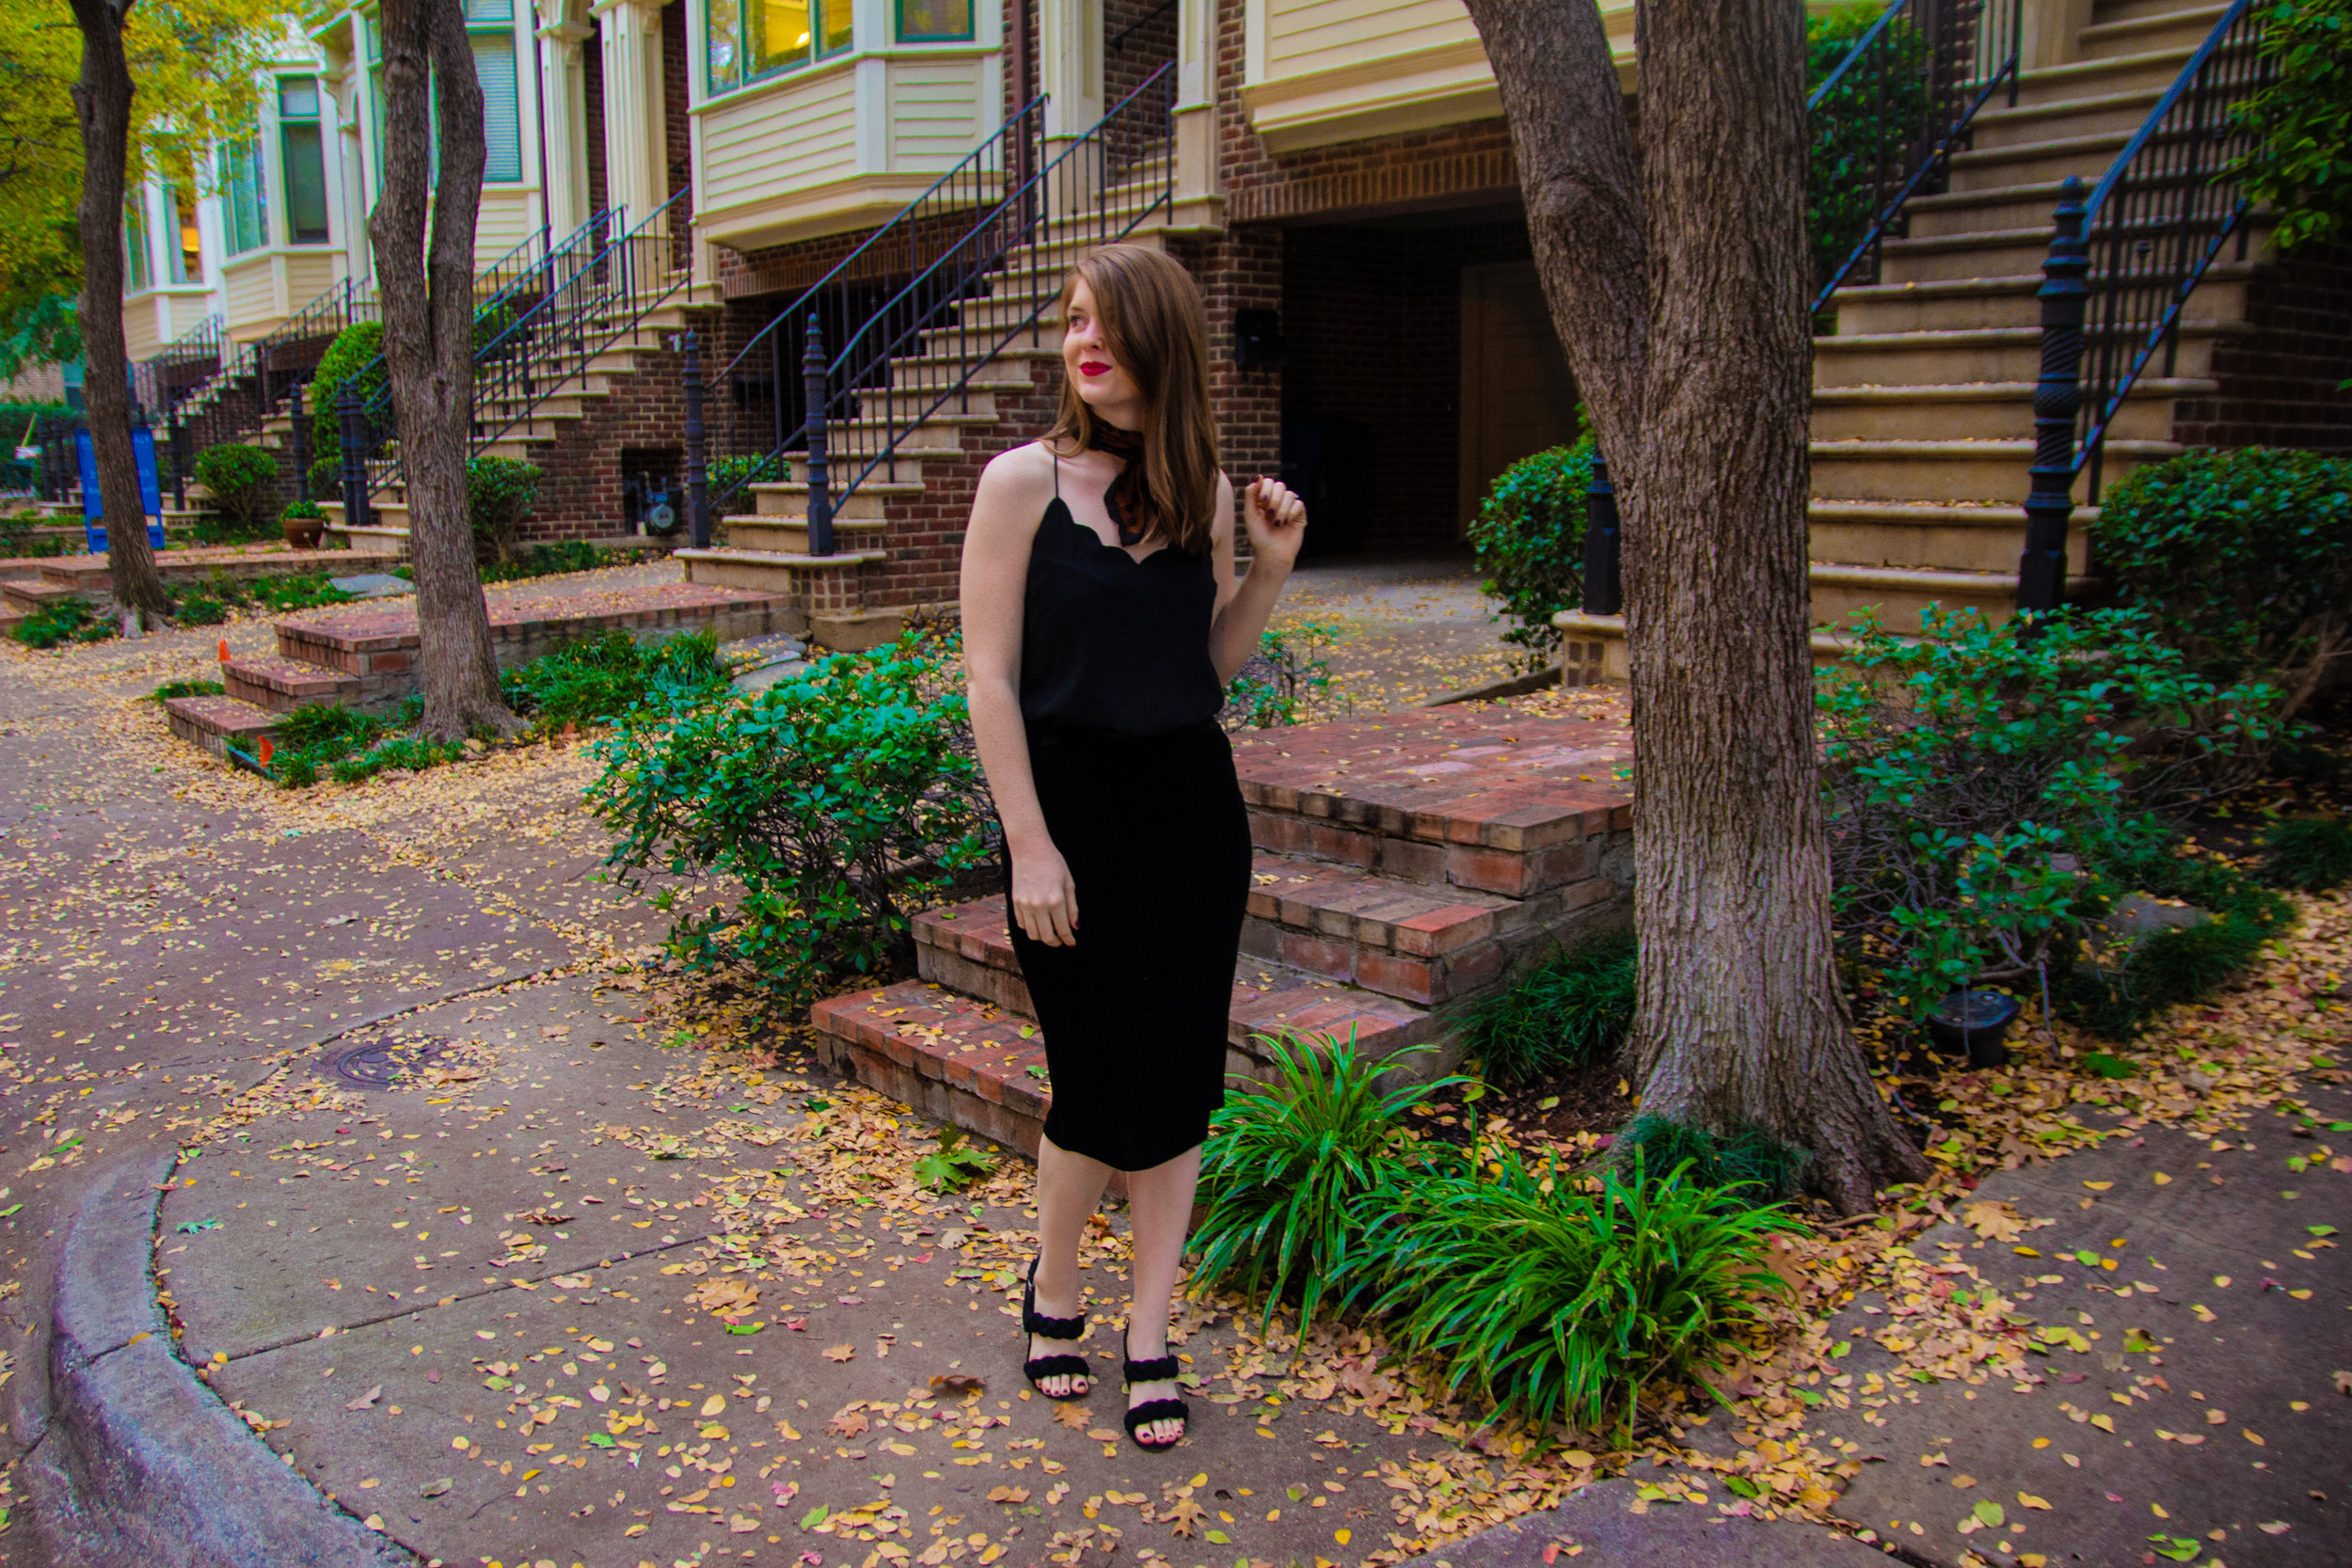 The Art of Versatility: Velvet Skirt 3 Ways, vince camuto velvet skirt, j.crew factory scalloped cami, madewell leopard cotton scarf, myx lipstick, rebecca minkoff candace block heel sandal